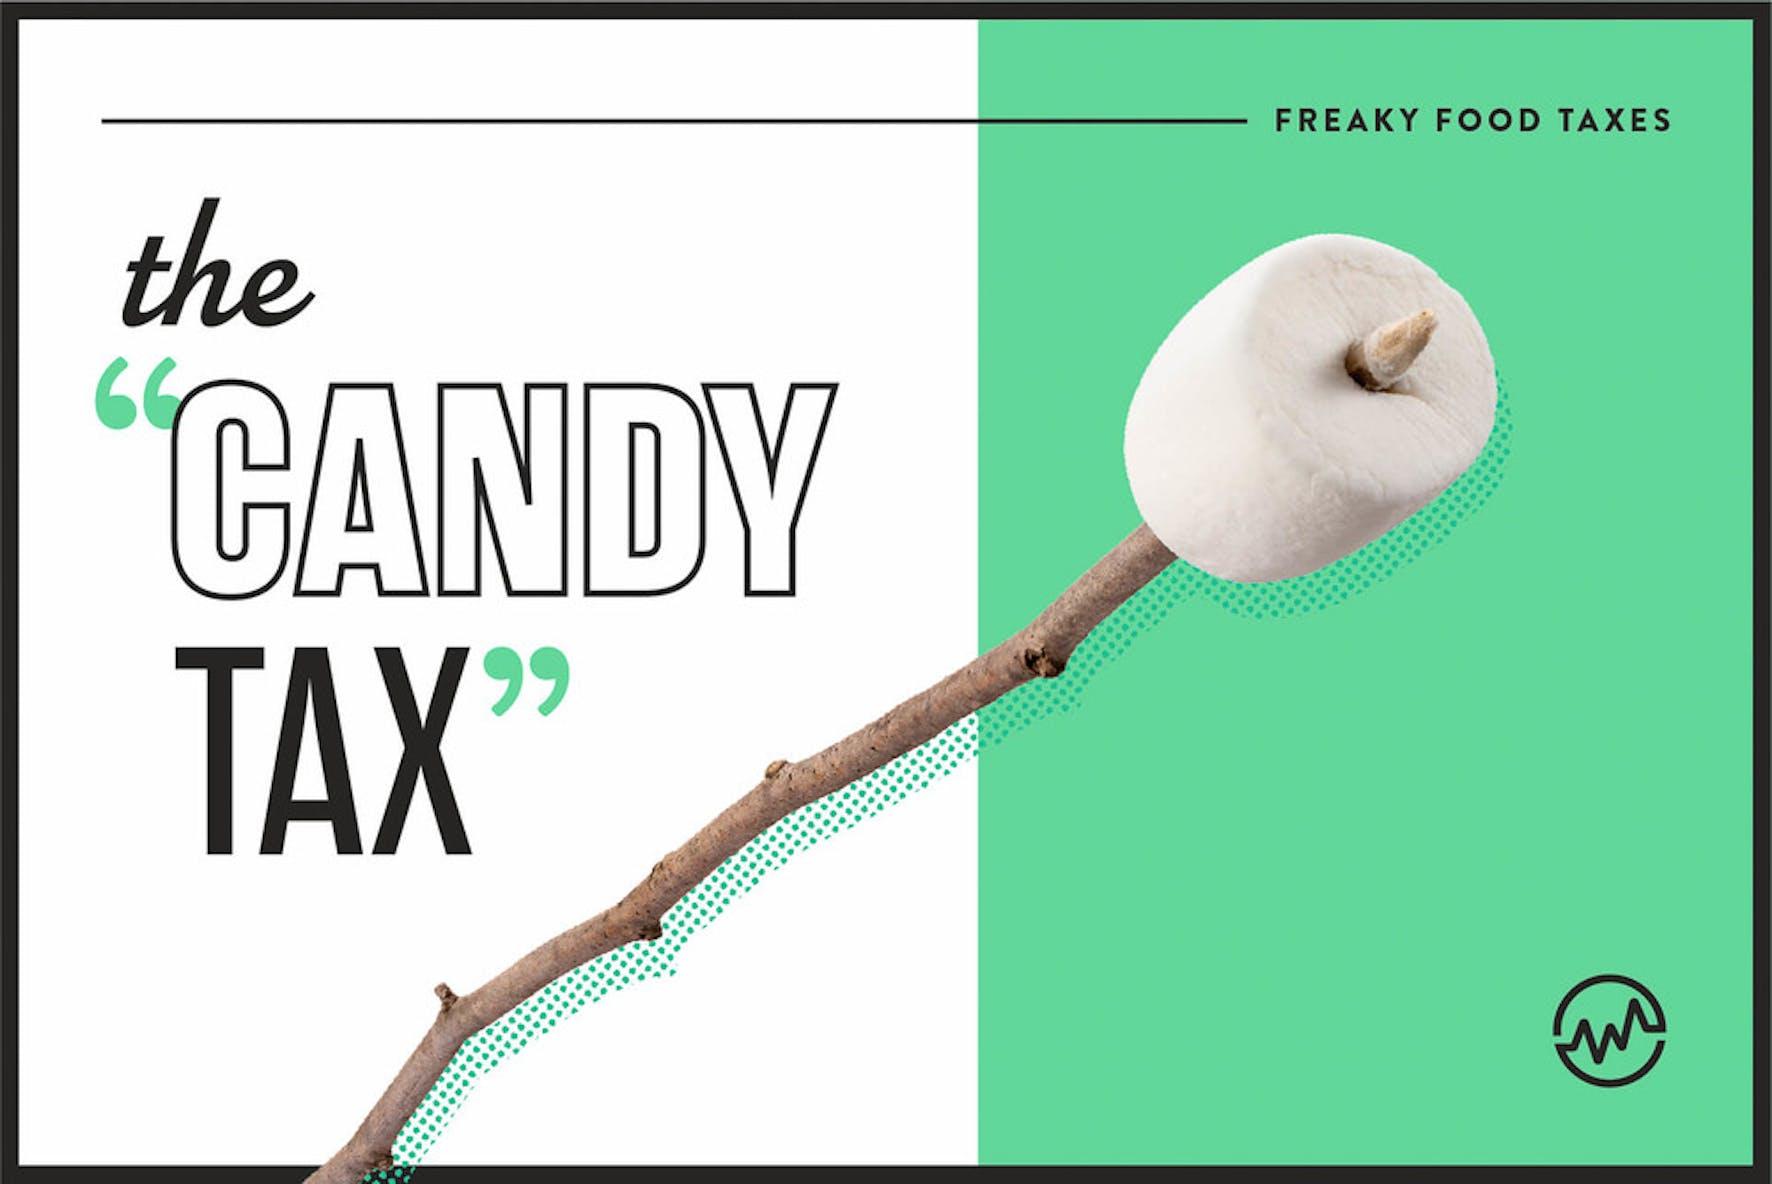 weird food taxes - the candy tax for marshmallows